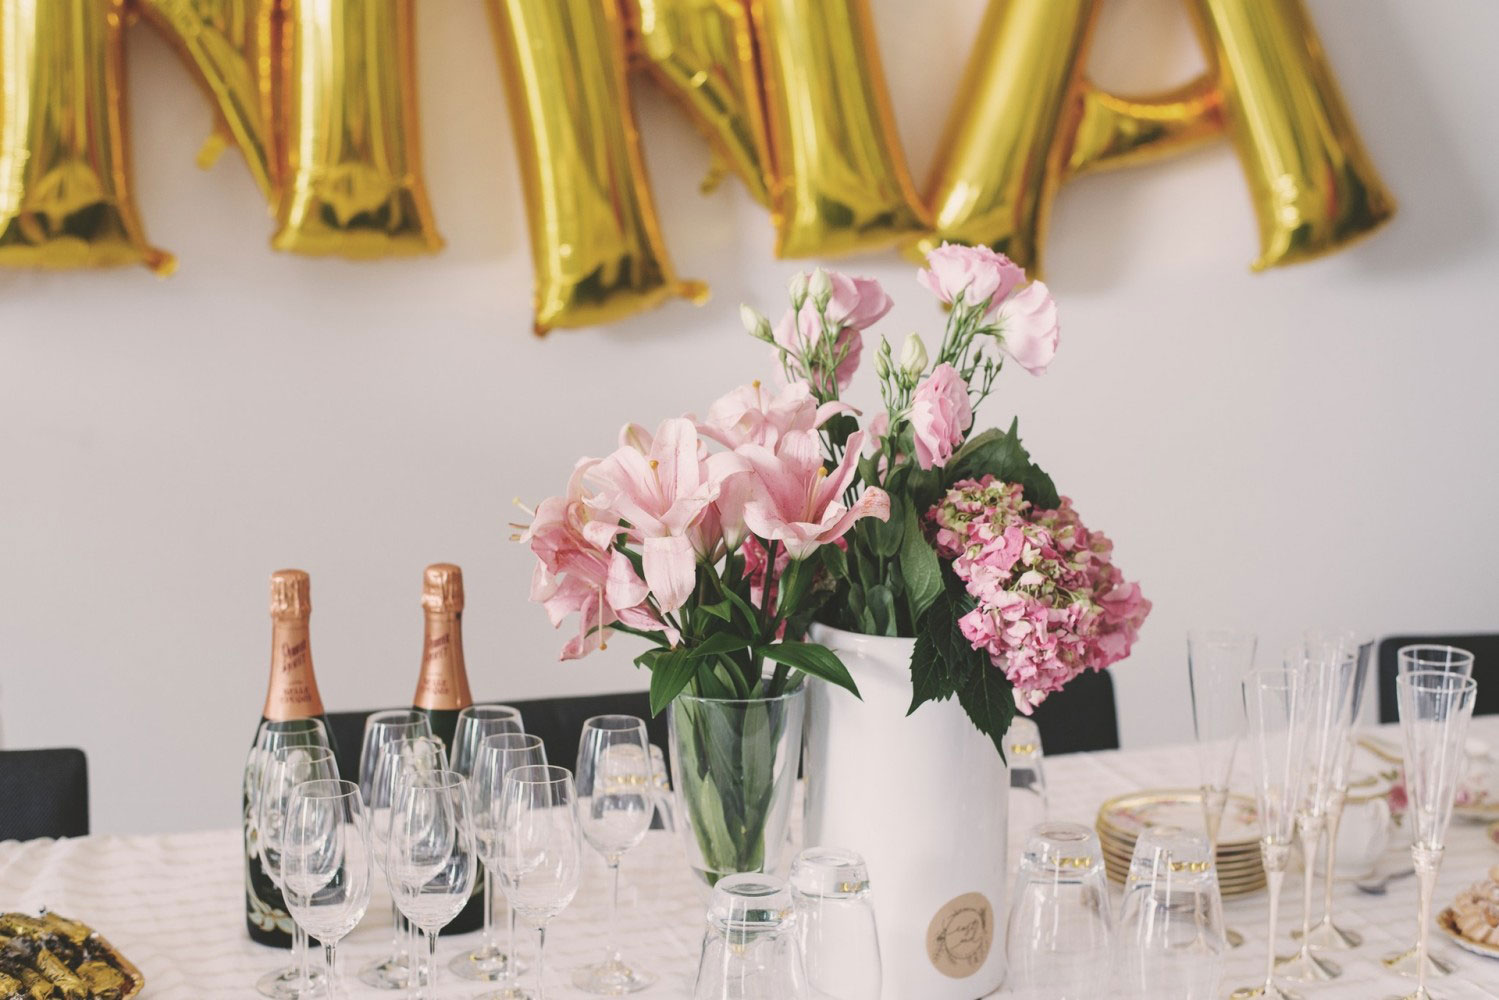 Jessica-Lemon-Photography-Adelaide-Wedding-Baptism-Christening-Engagment-Party-Event-Birthday-Photographer.jpg